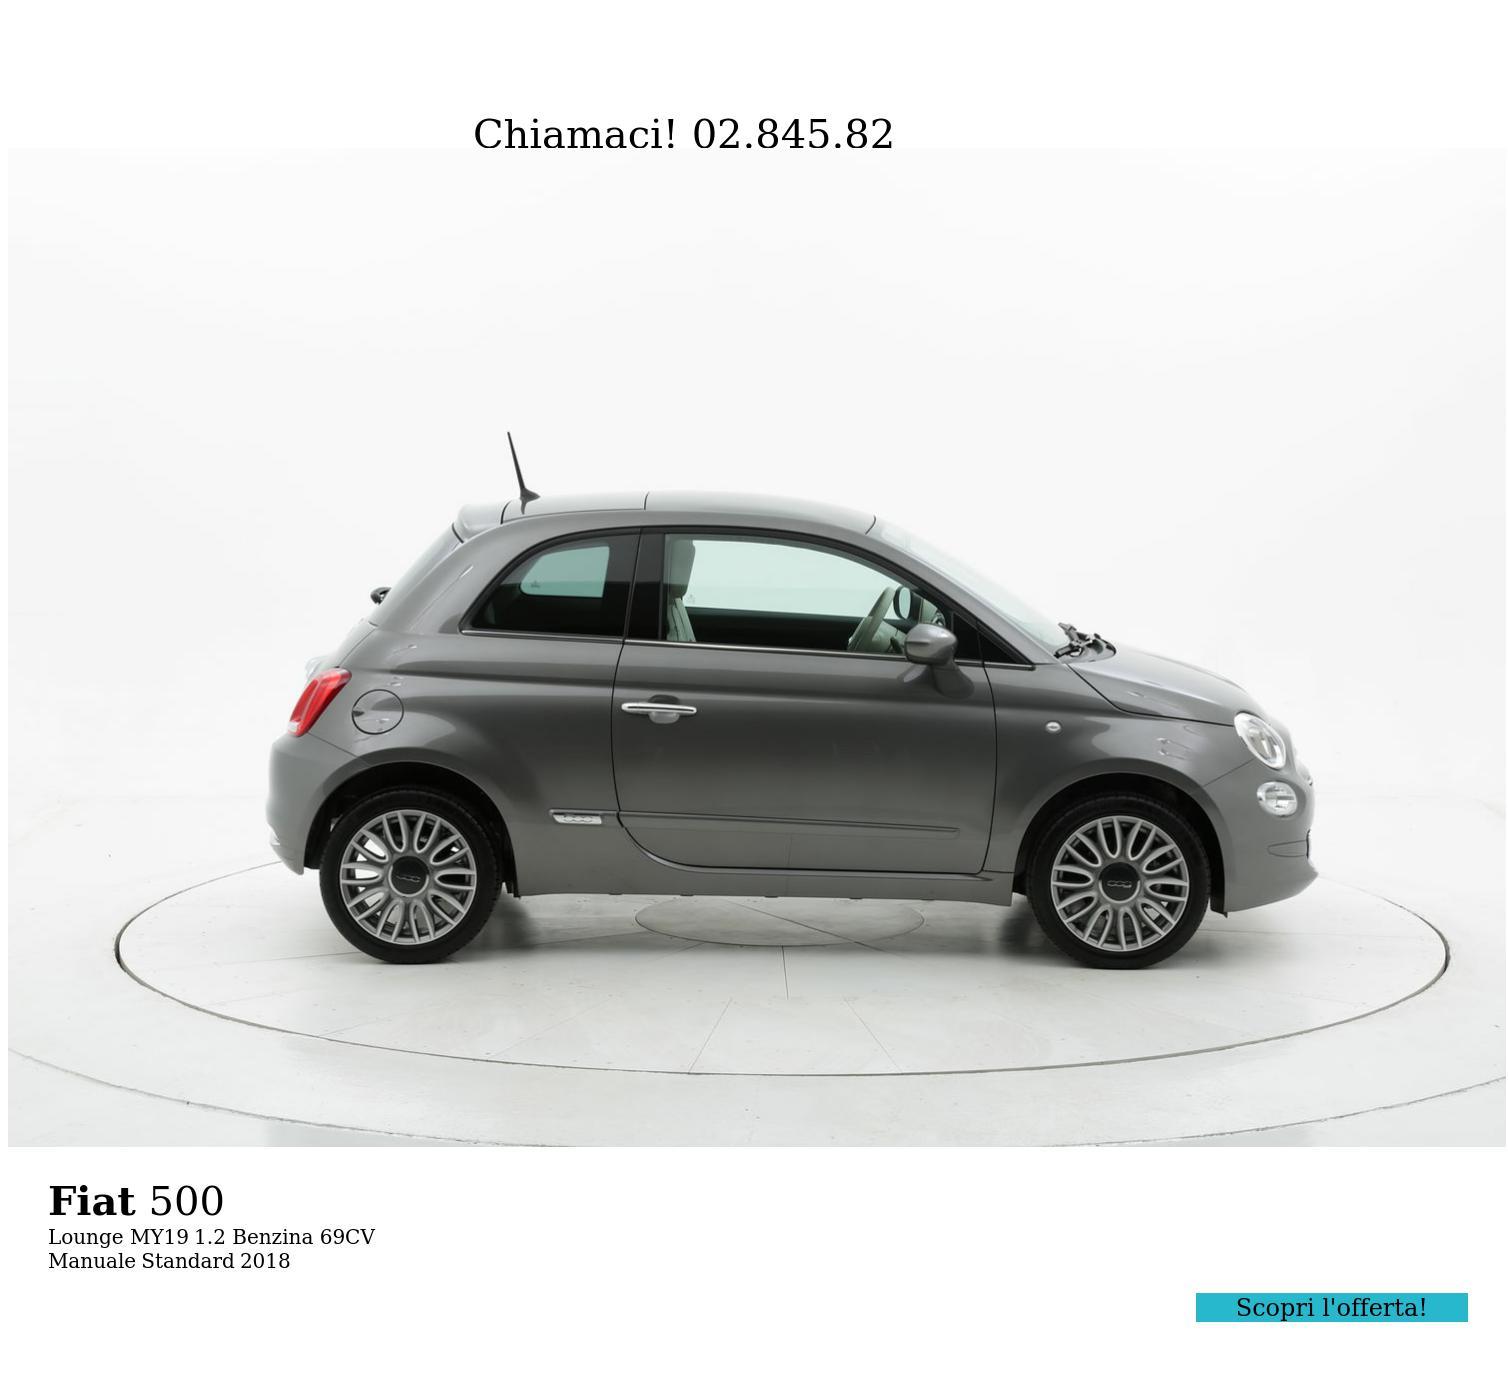 Fiat 500 Lounge MY19 km 0 benzina antracite | brumbrum